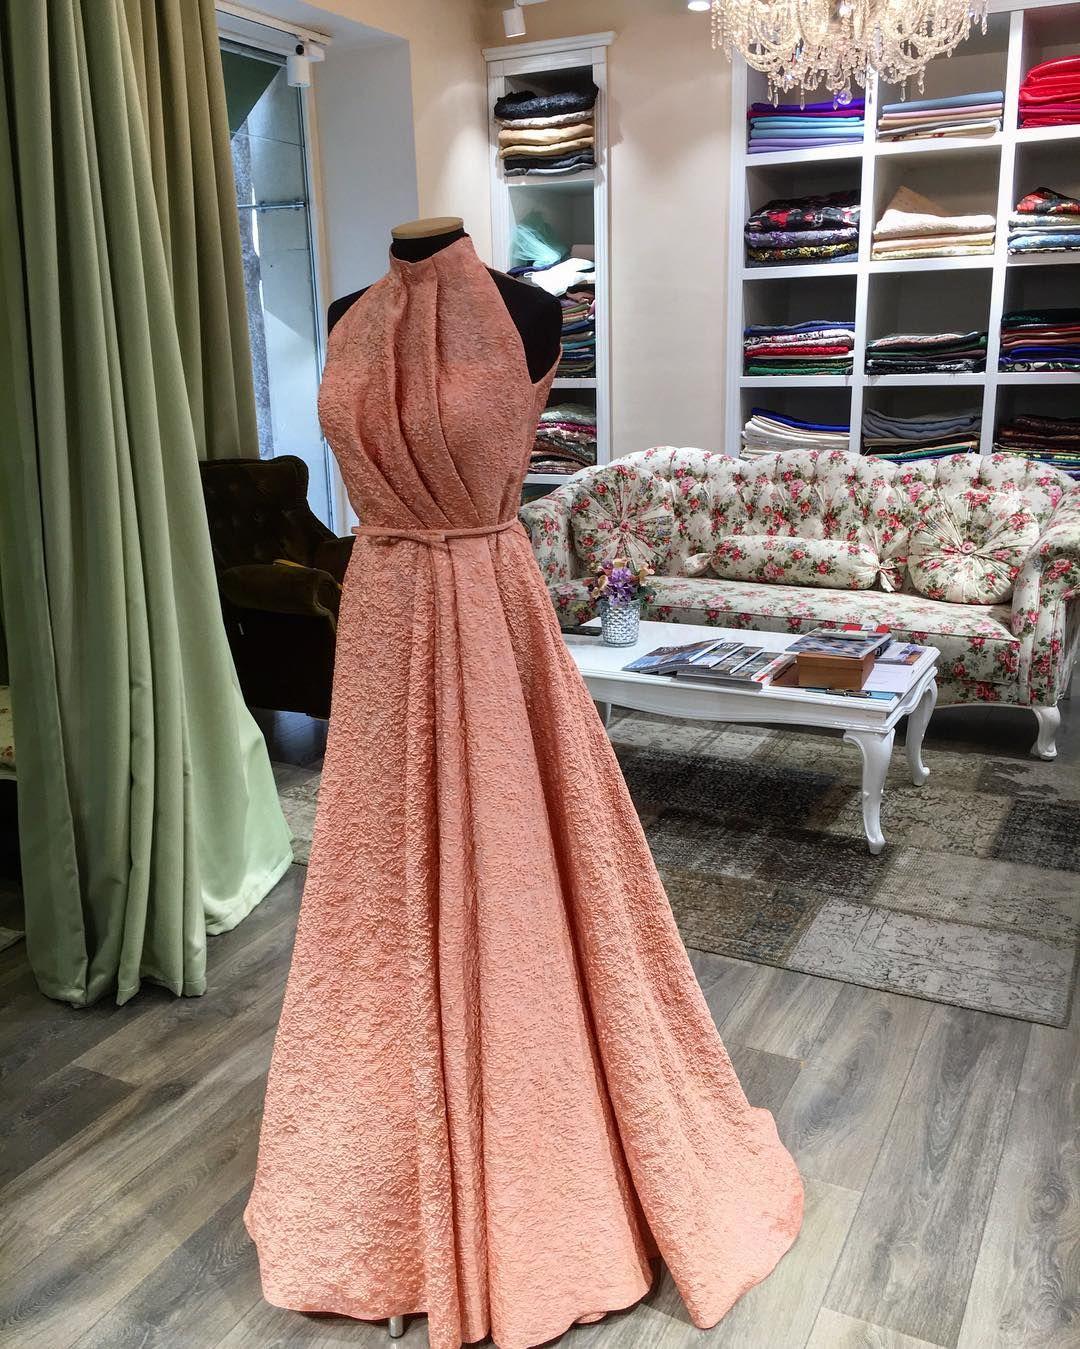 Evening Long Dress Instagram Da Libas Couture Atelier Libascouture Libas Atelier Today Work Ideas Readytowear Evening Dresses Long Long Dress Dresses